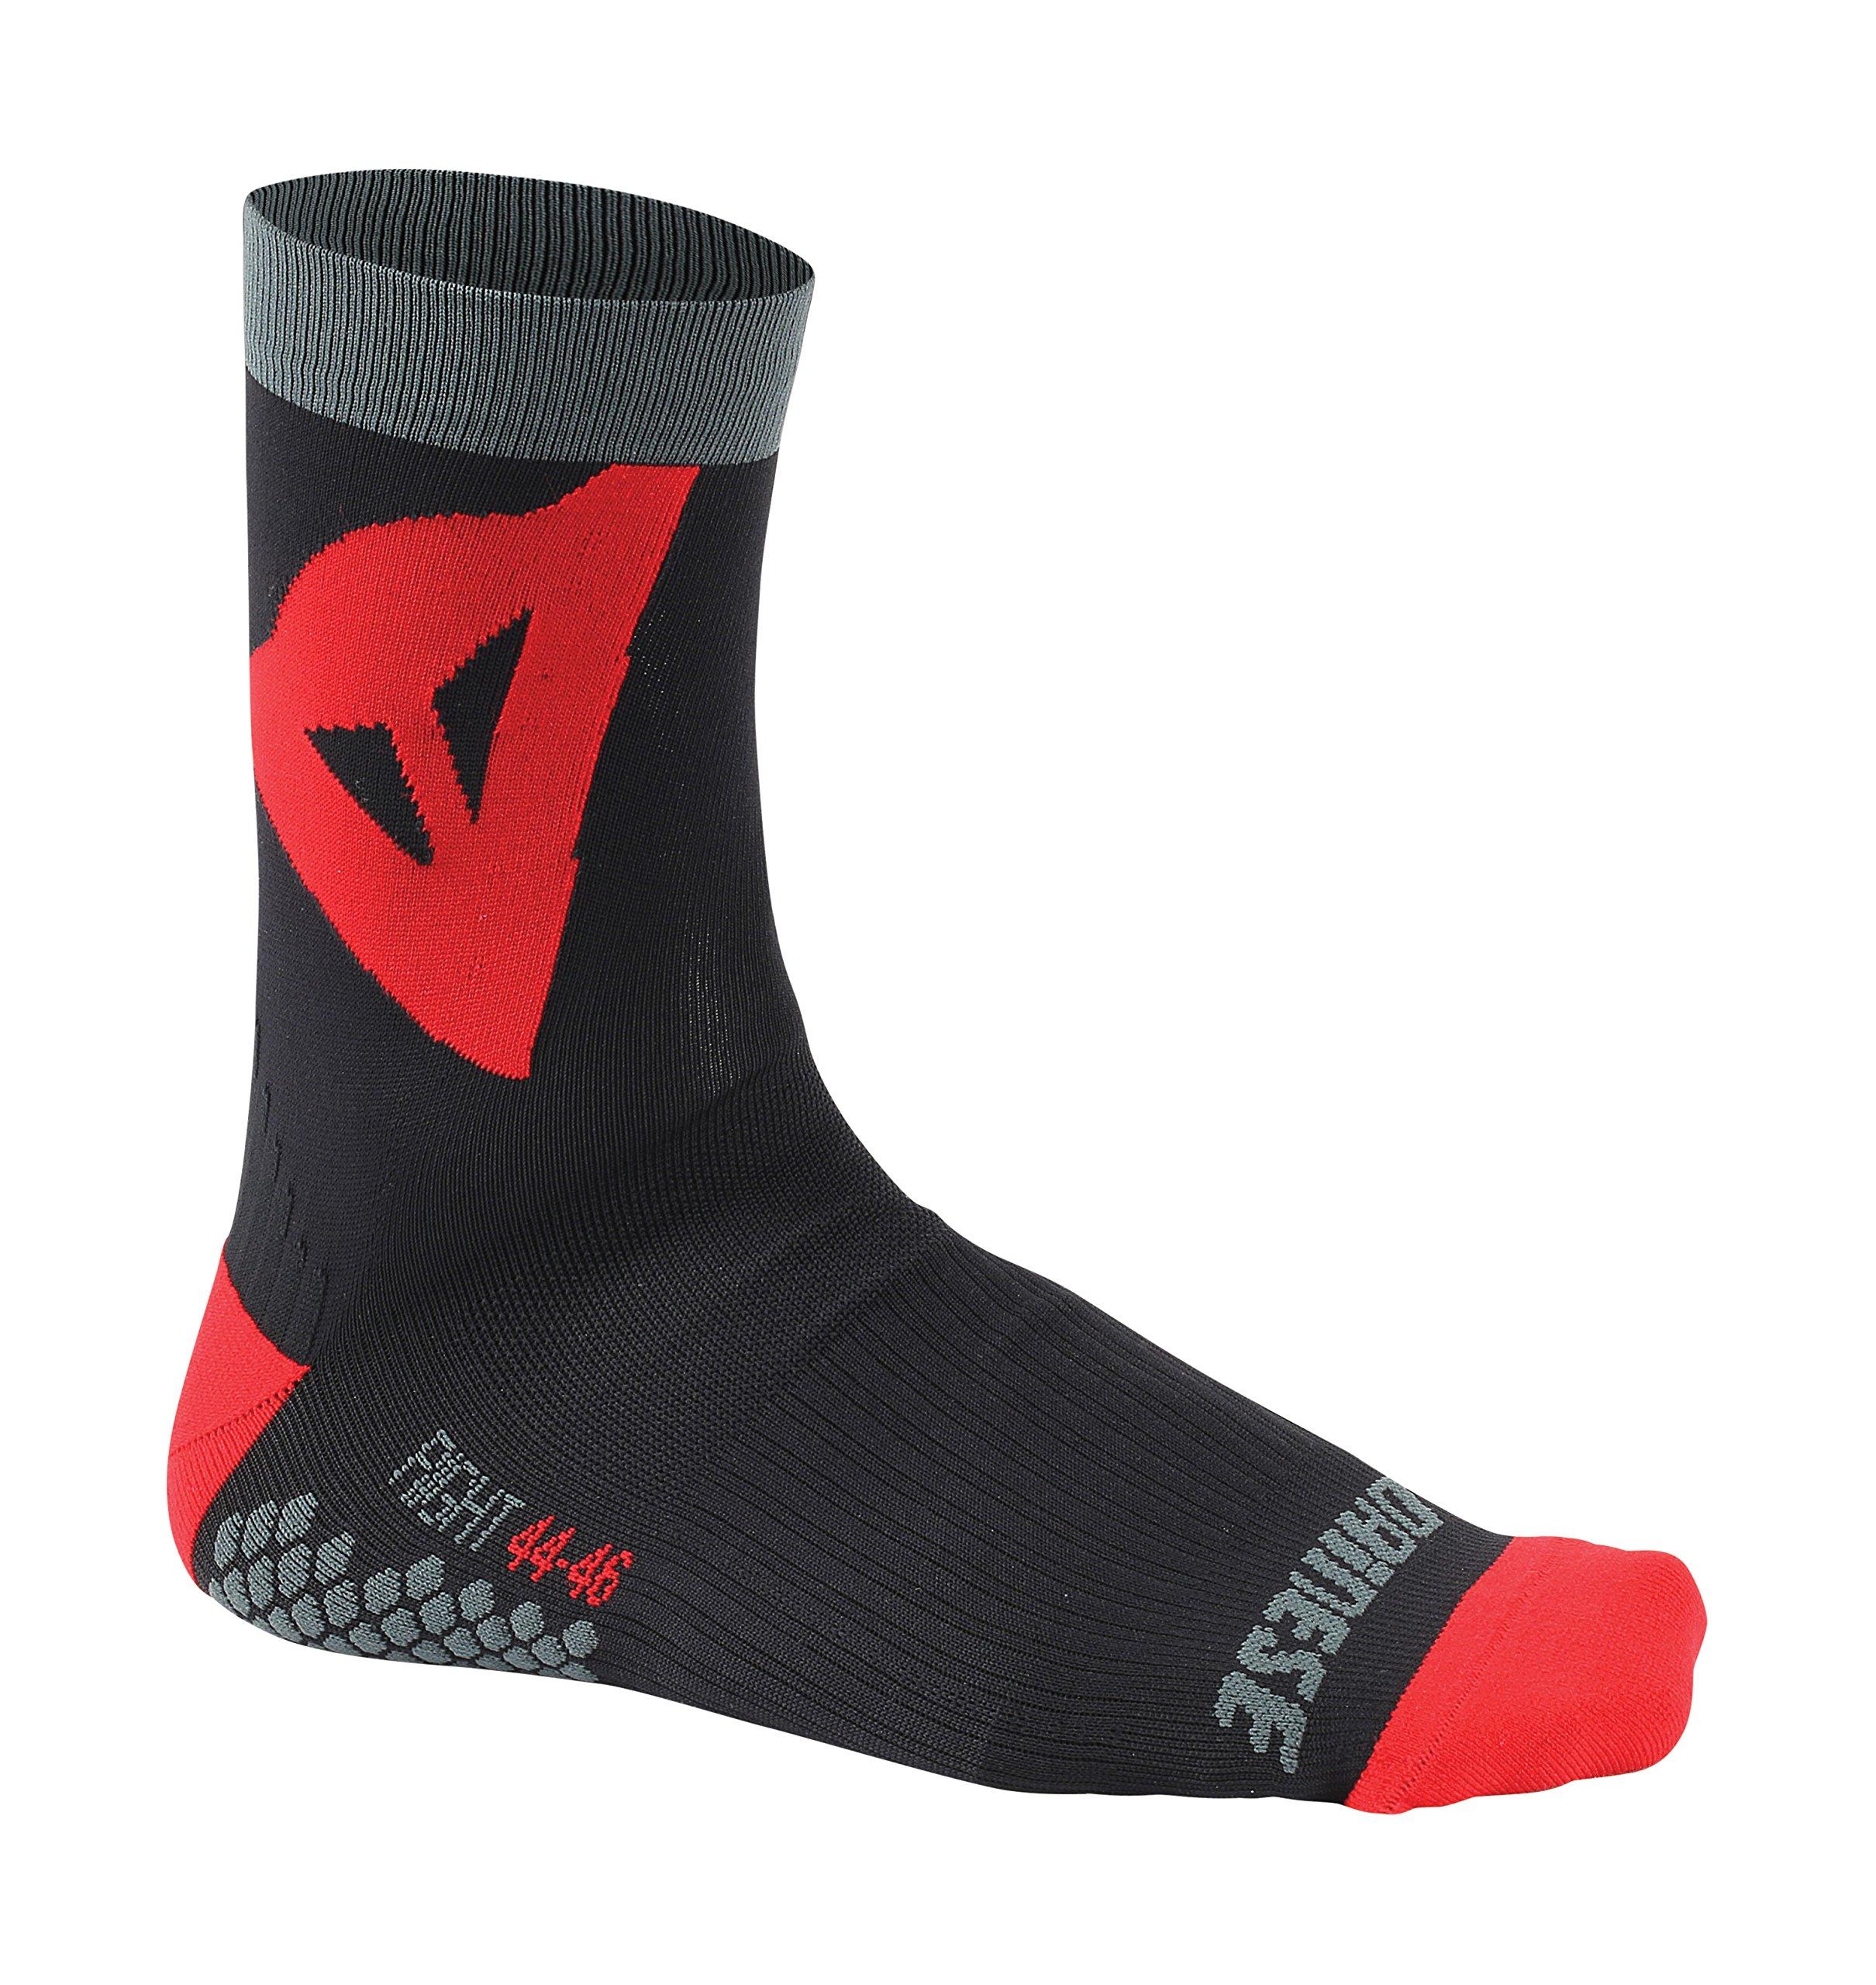 Dainese Herren Riding Mid Socken, Schwarz/Rot, L